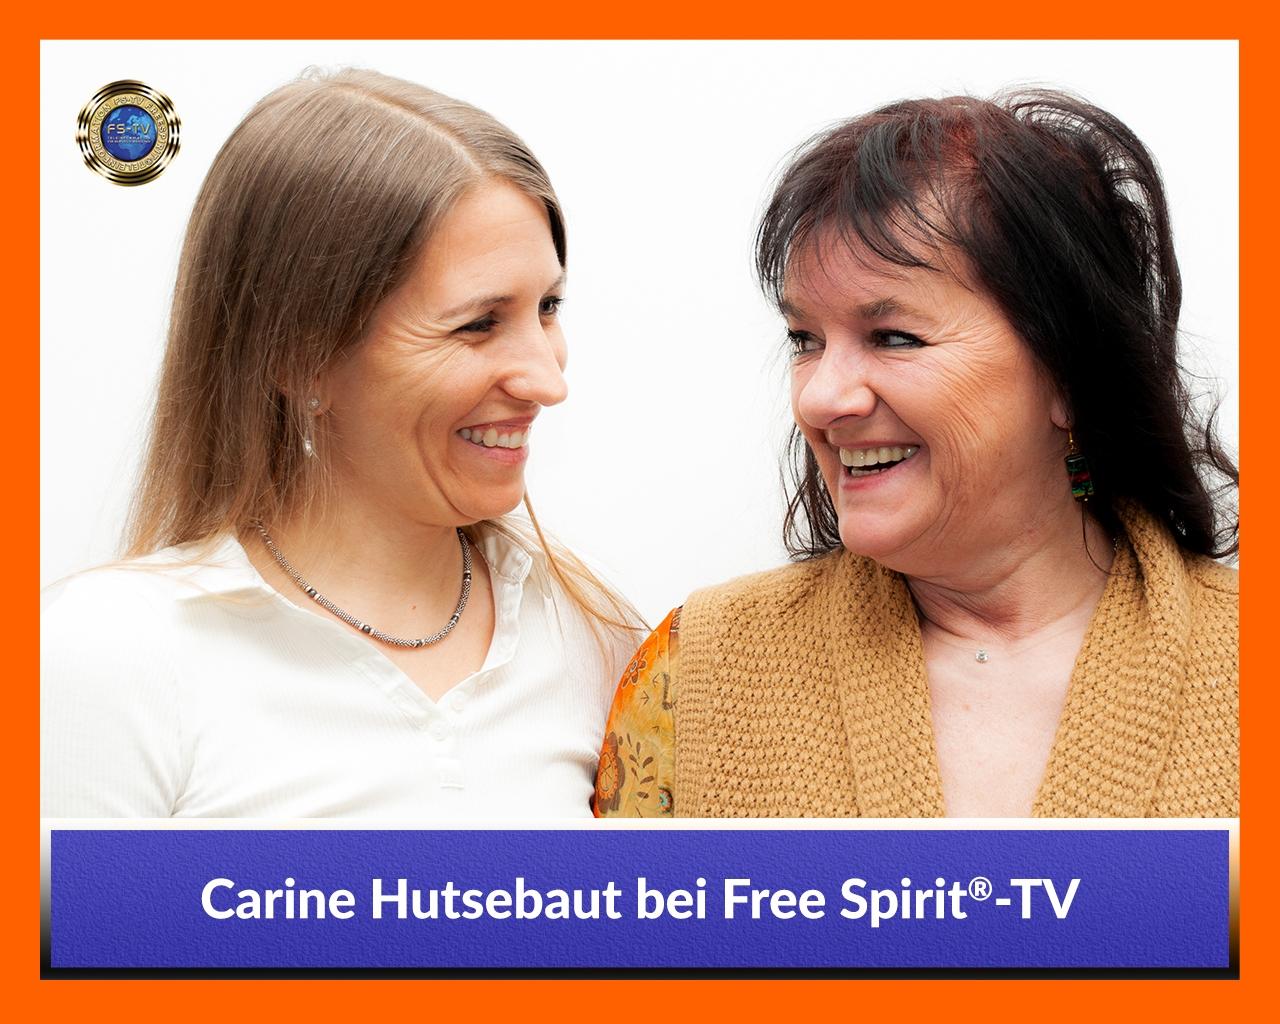 Galleriebild-Carine-Hutsebaut-08